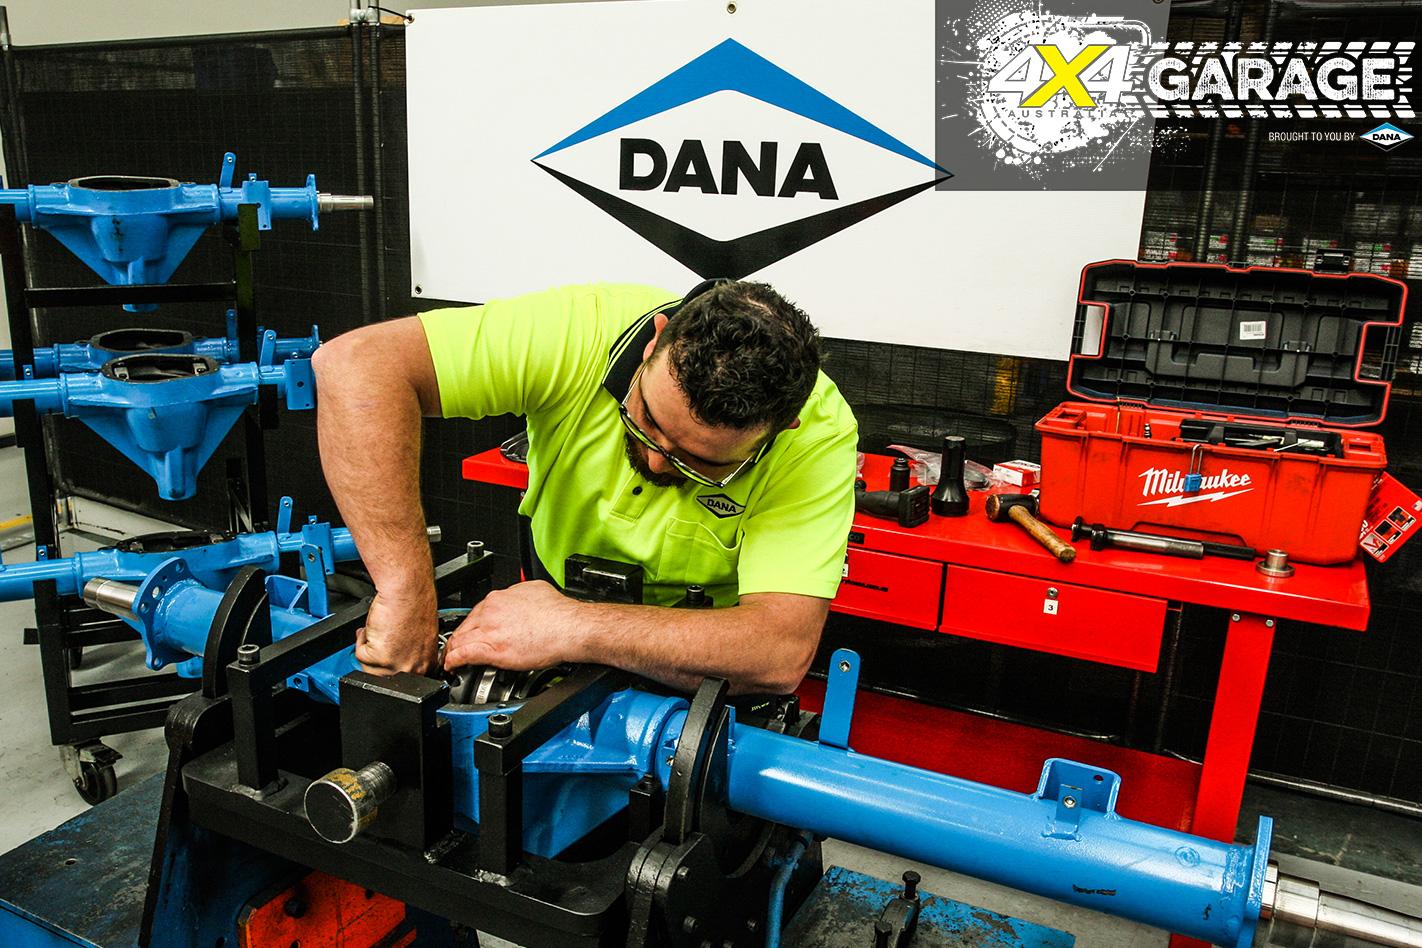 4X4 Garage: Dana Australia's Ultimate 60 rear-axle kit